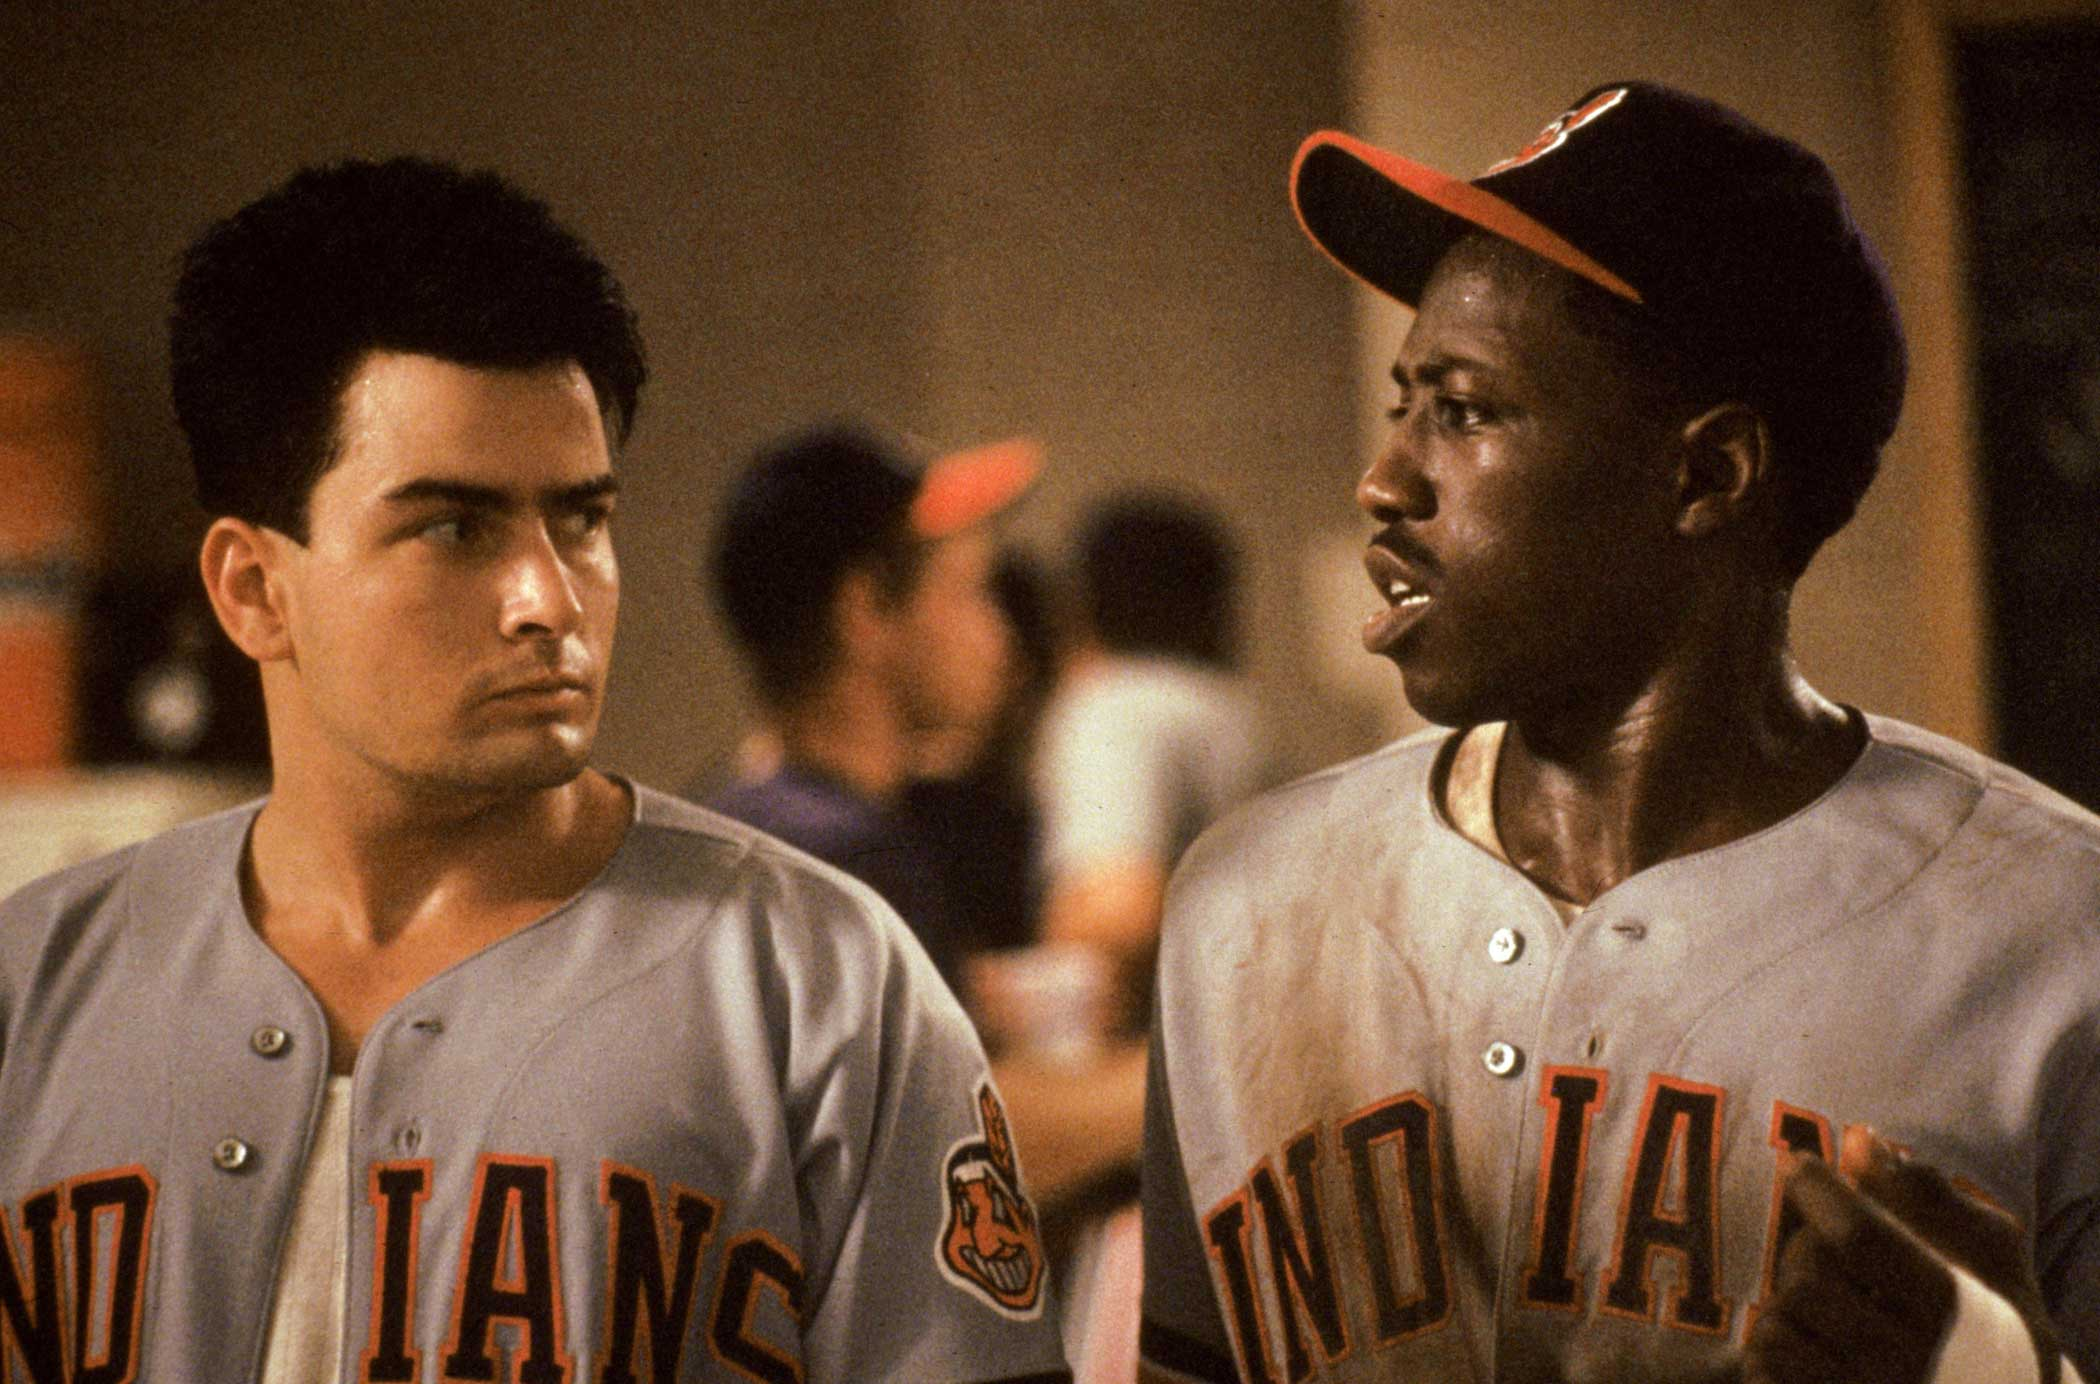 Major League, 1989